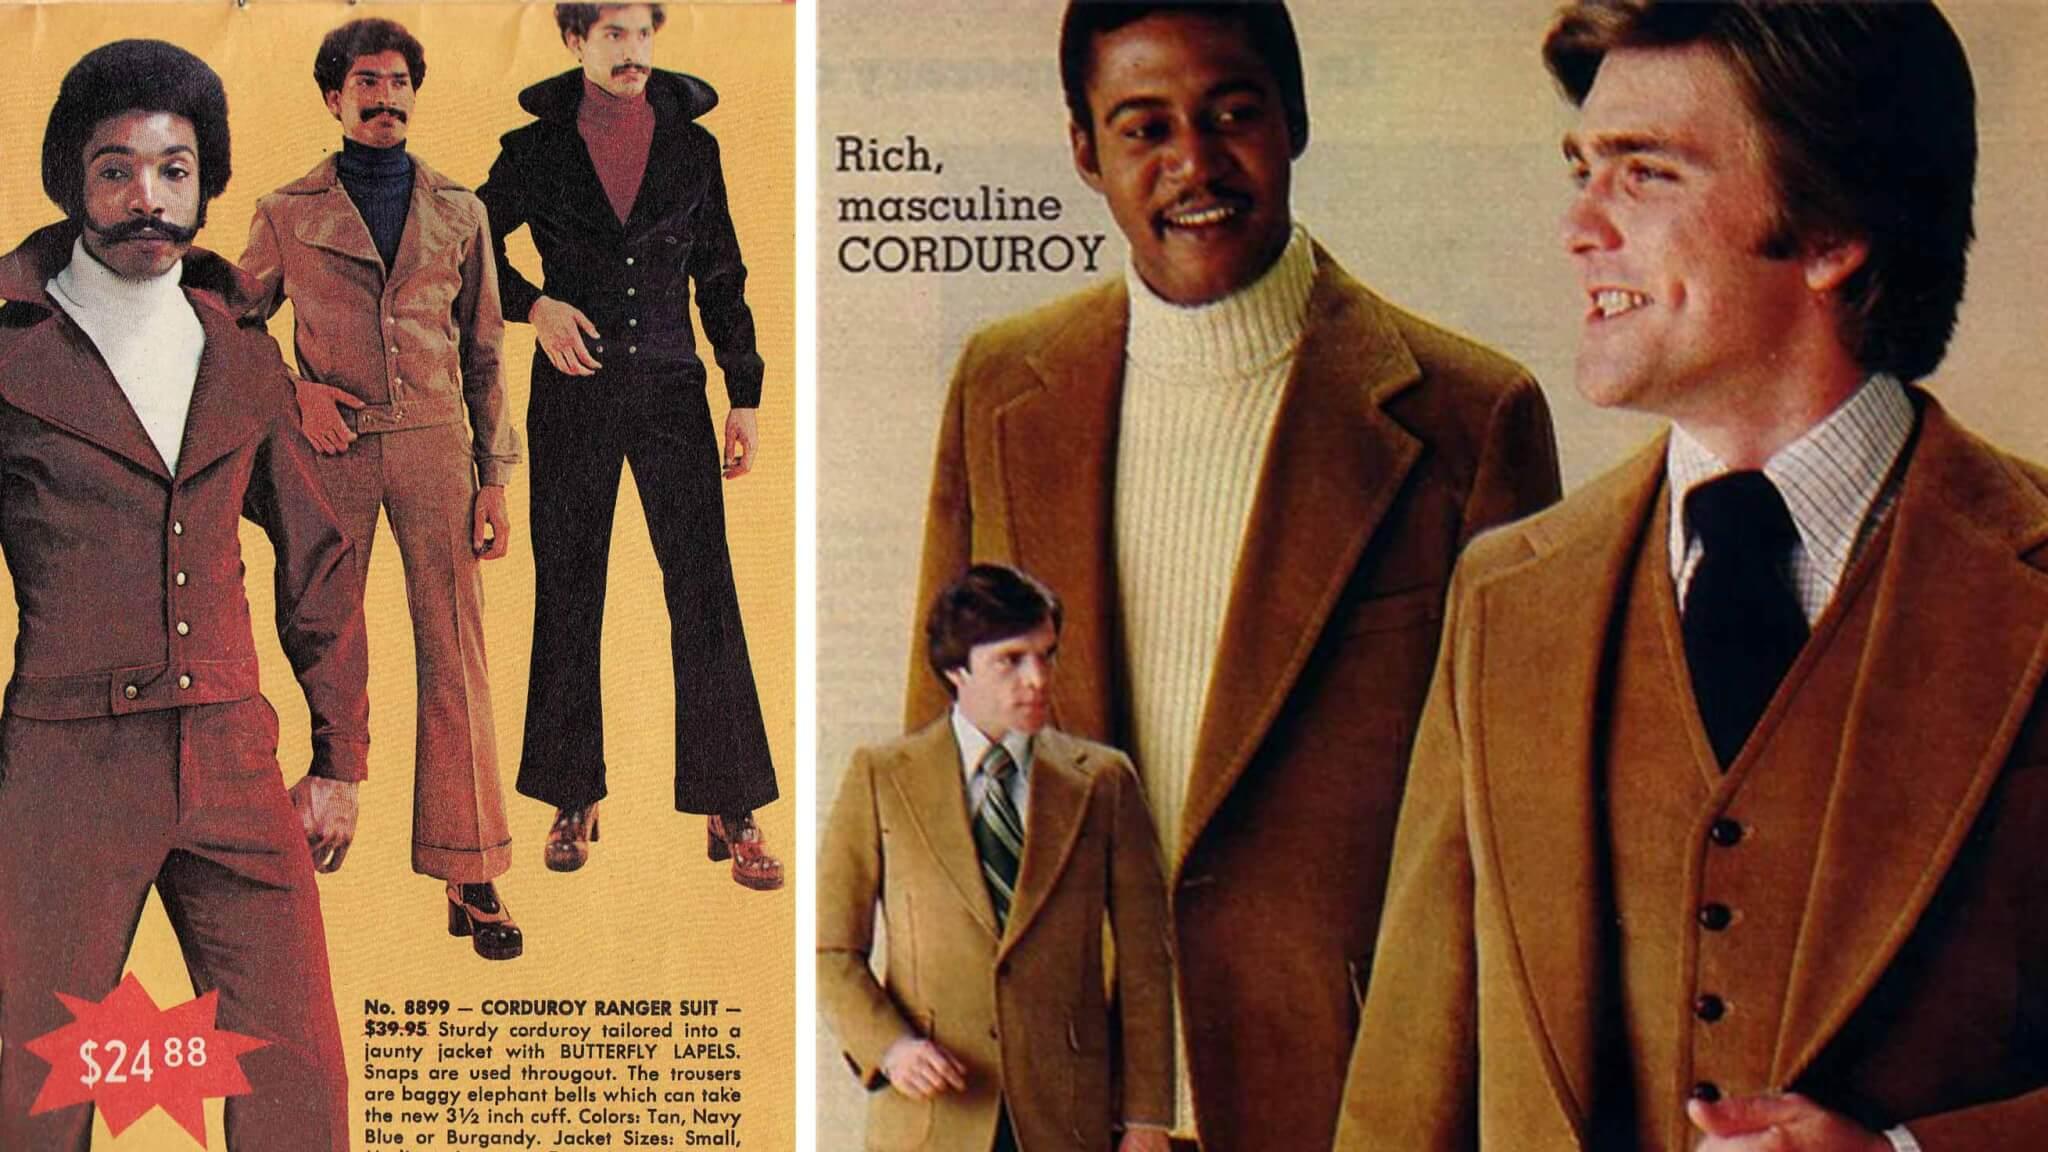 corduroy-suits-1970s